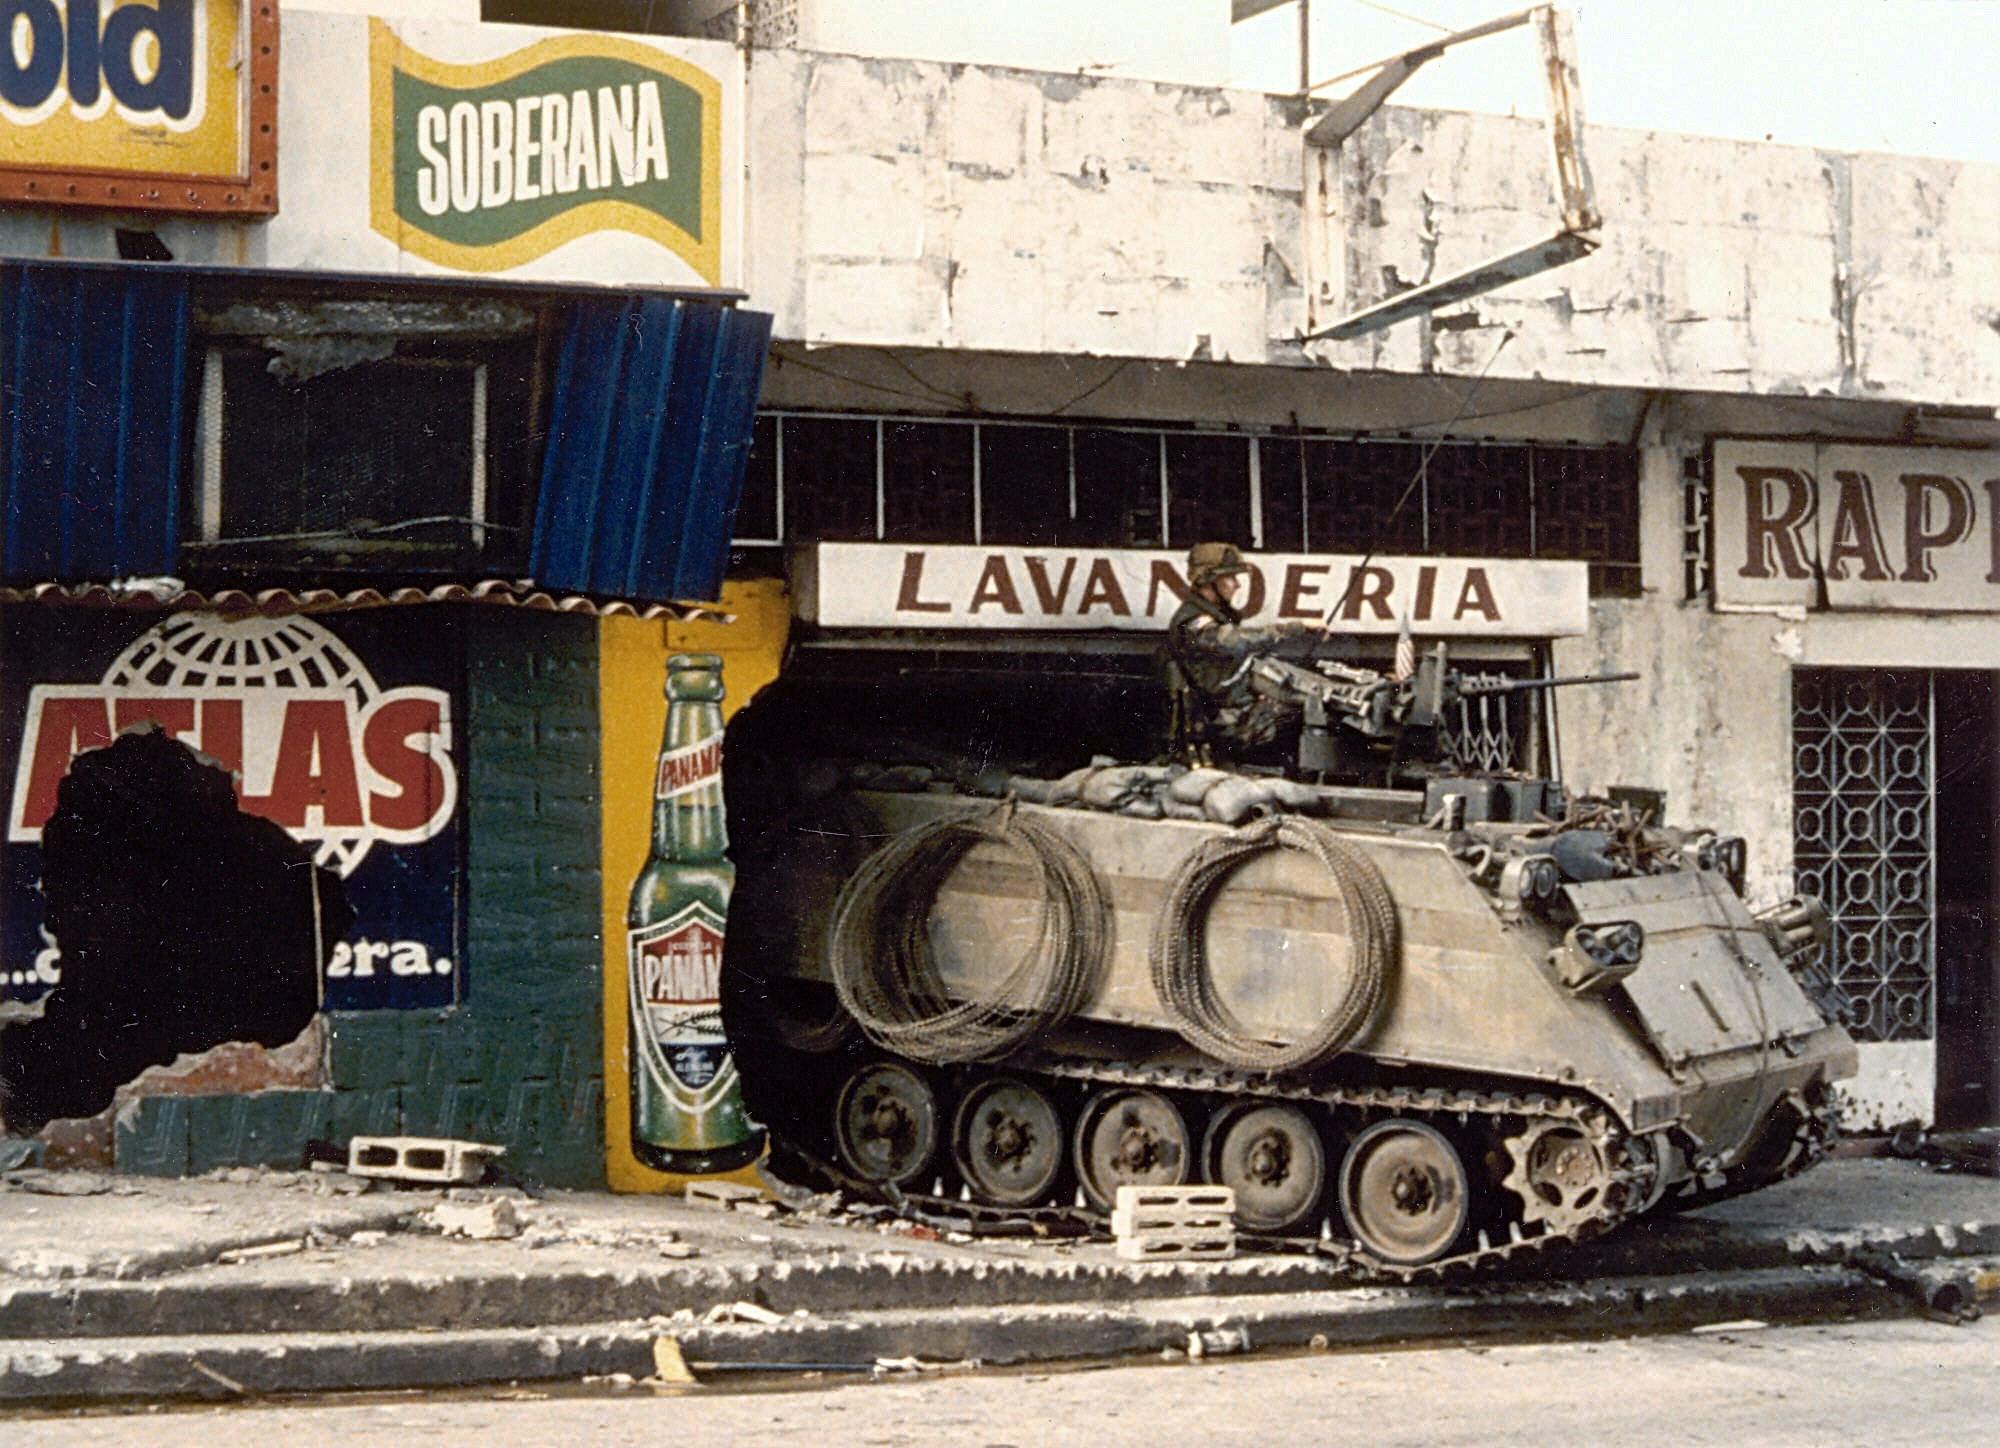 United States invasion of Panama